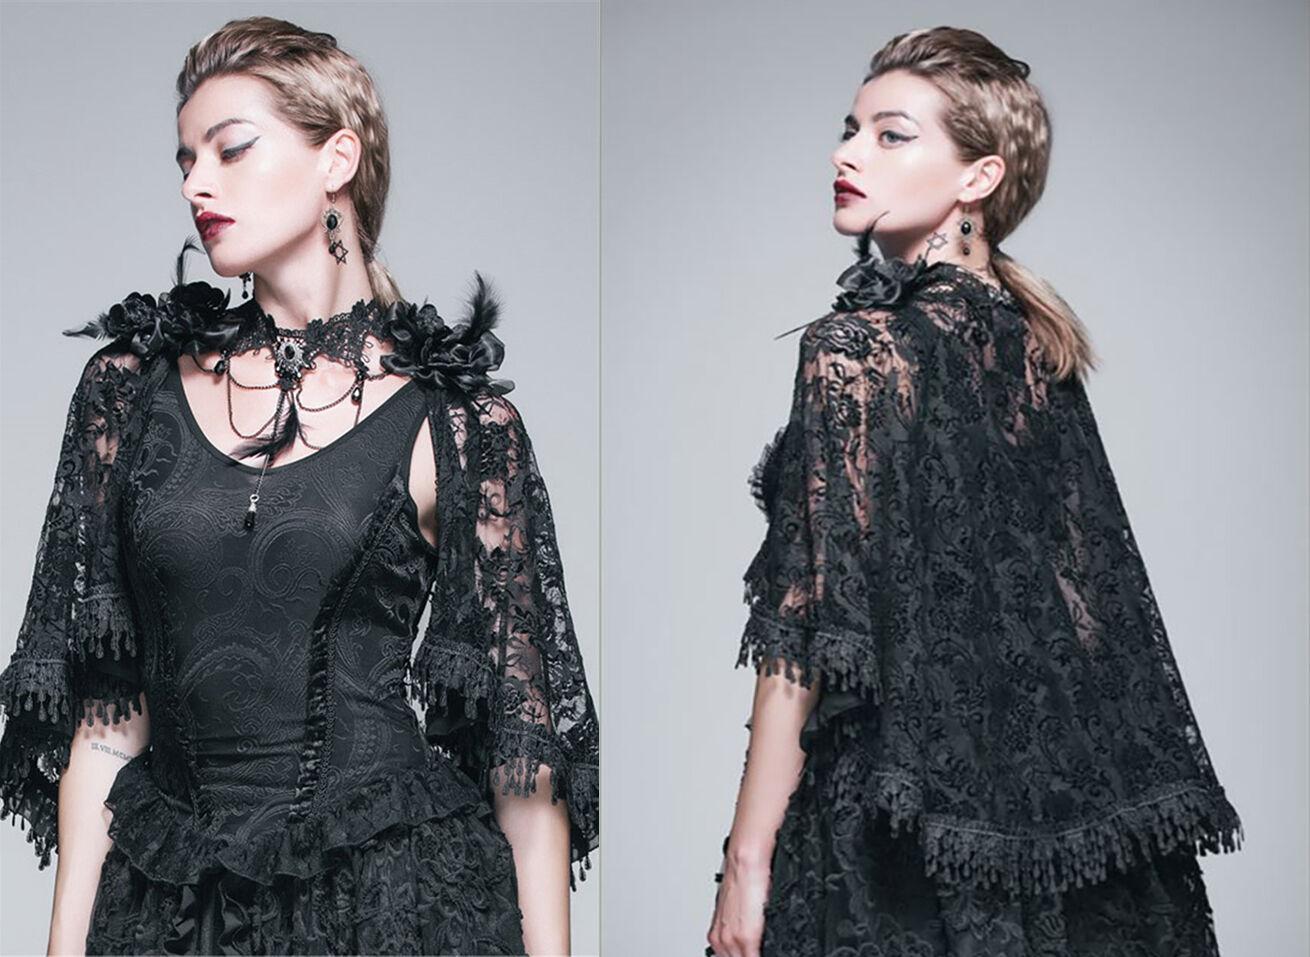 Devil Fashion Top SET Cape Umhang Shirt Gothic Blause Nugoth Spitze Rosan TT026